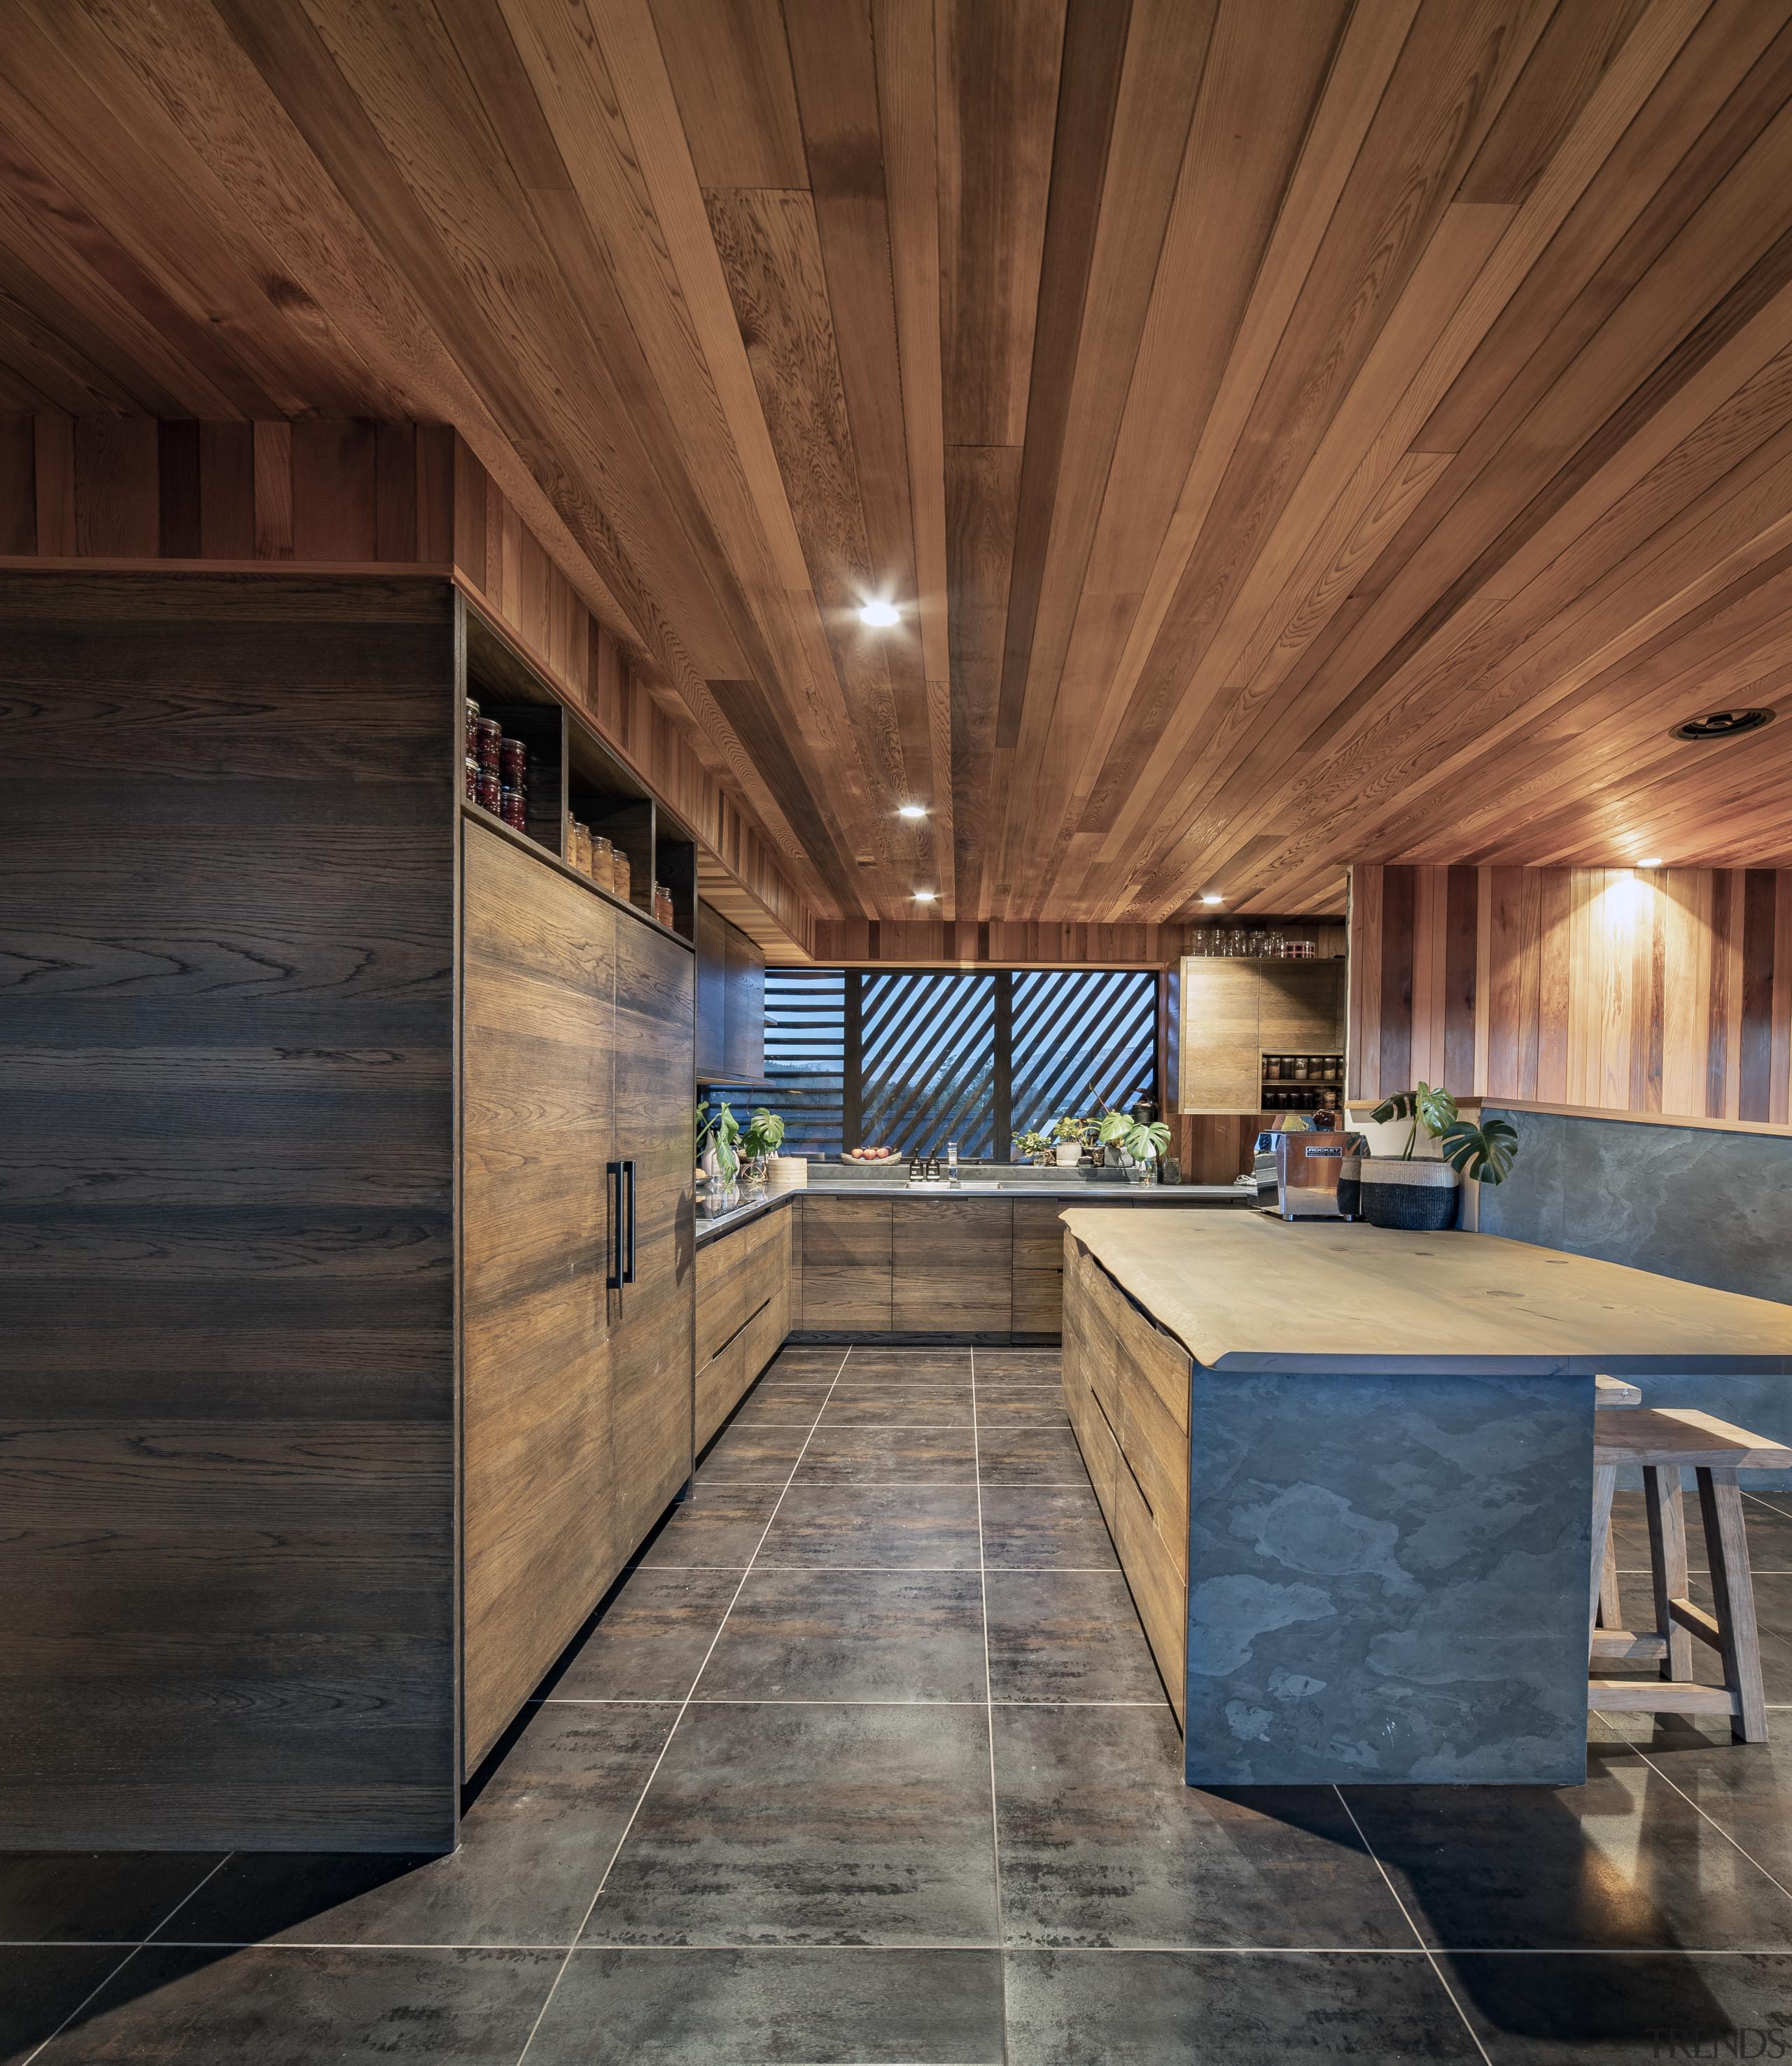 The warm look of wood ceilings and wood brown